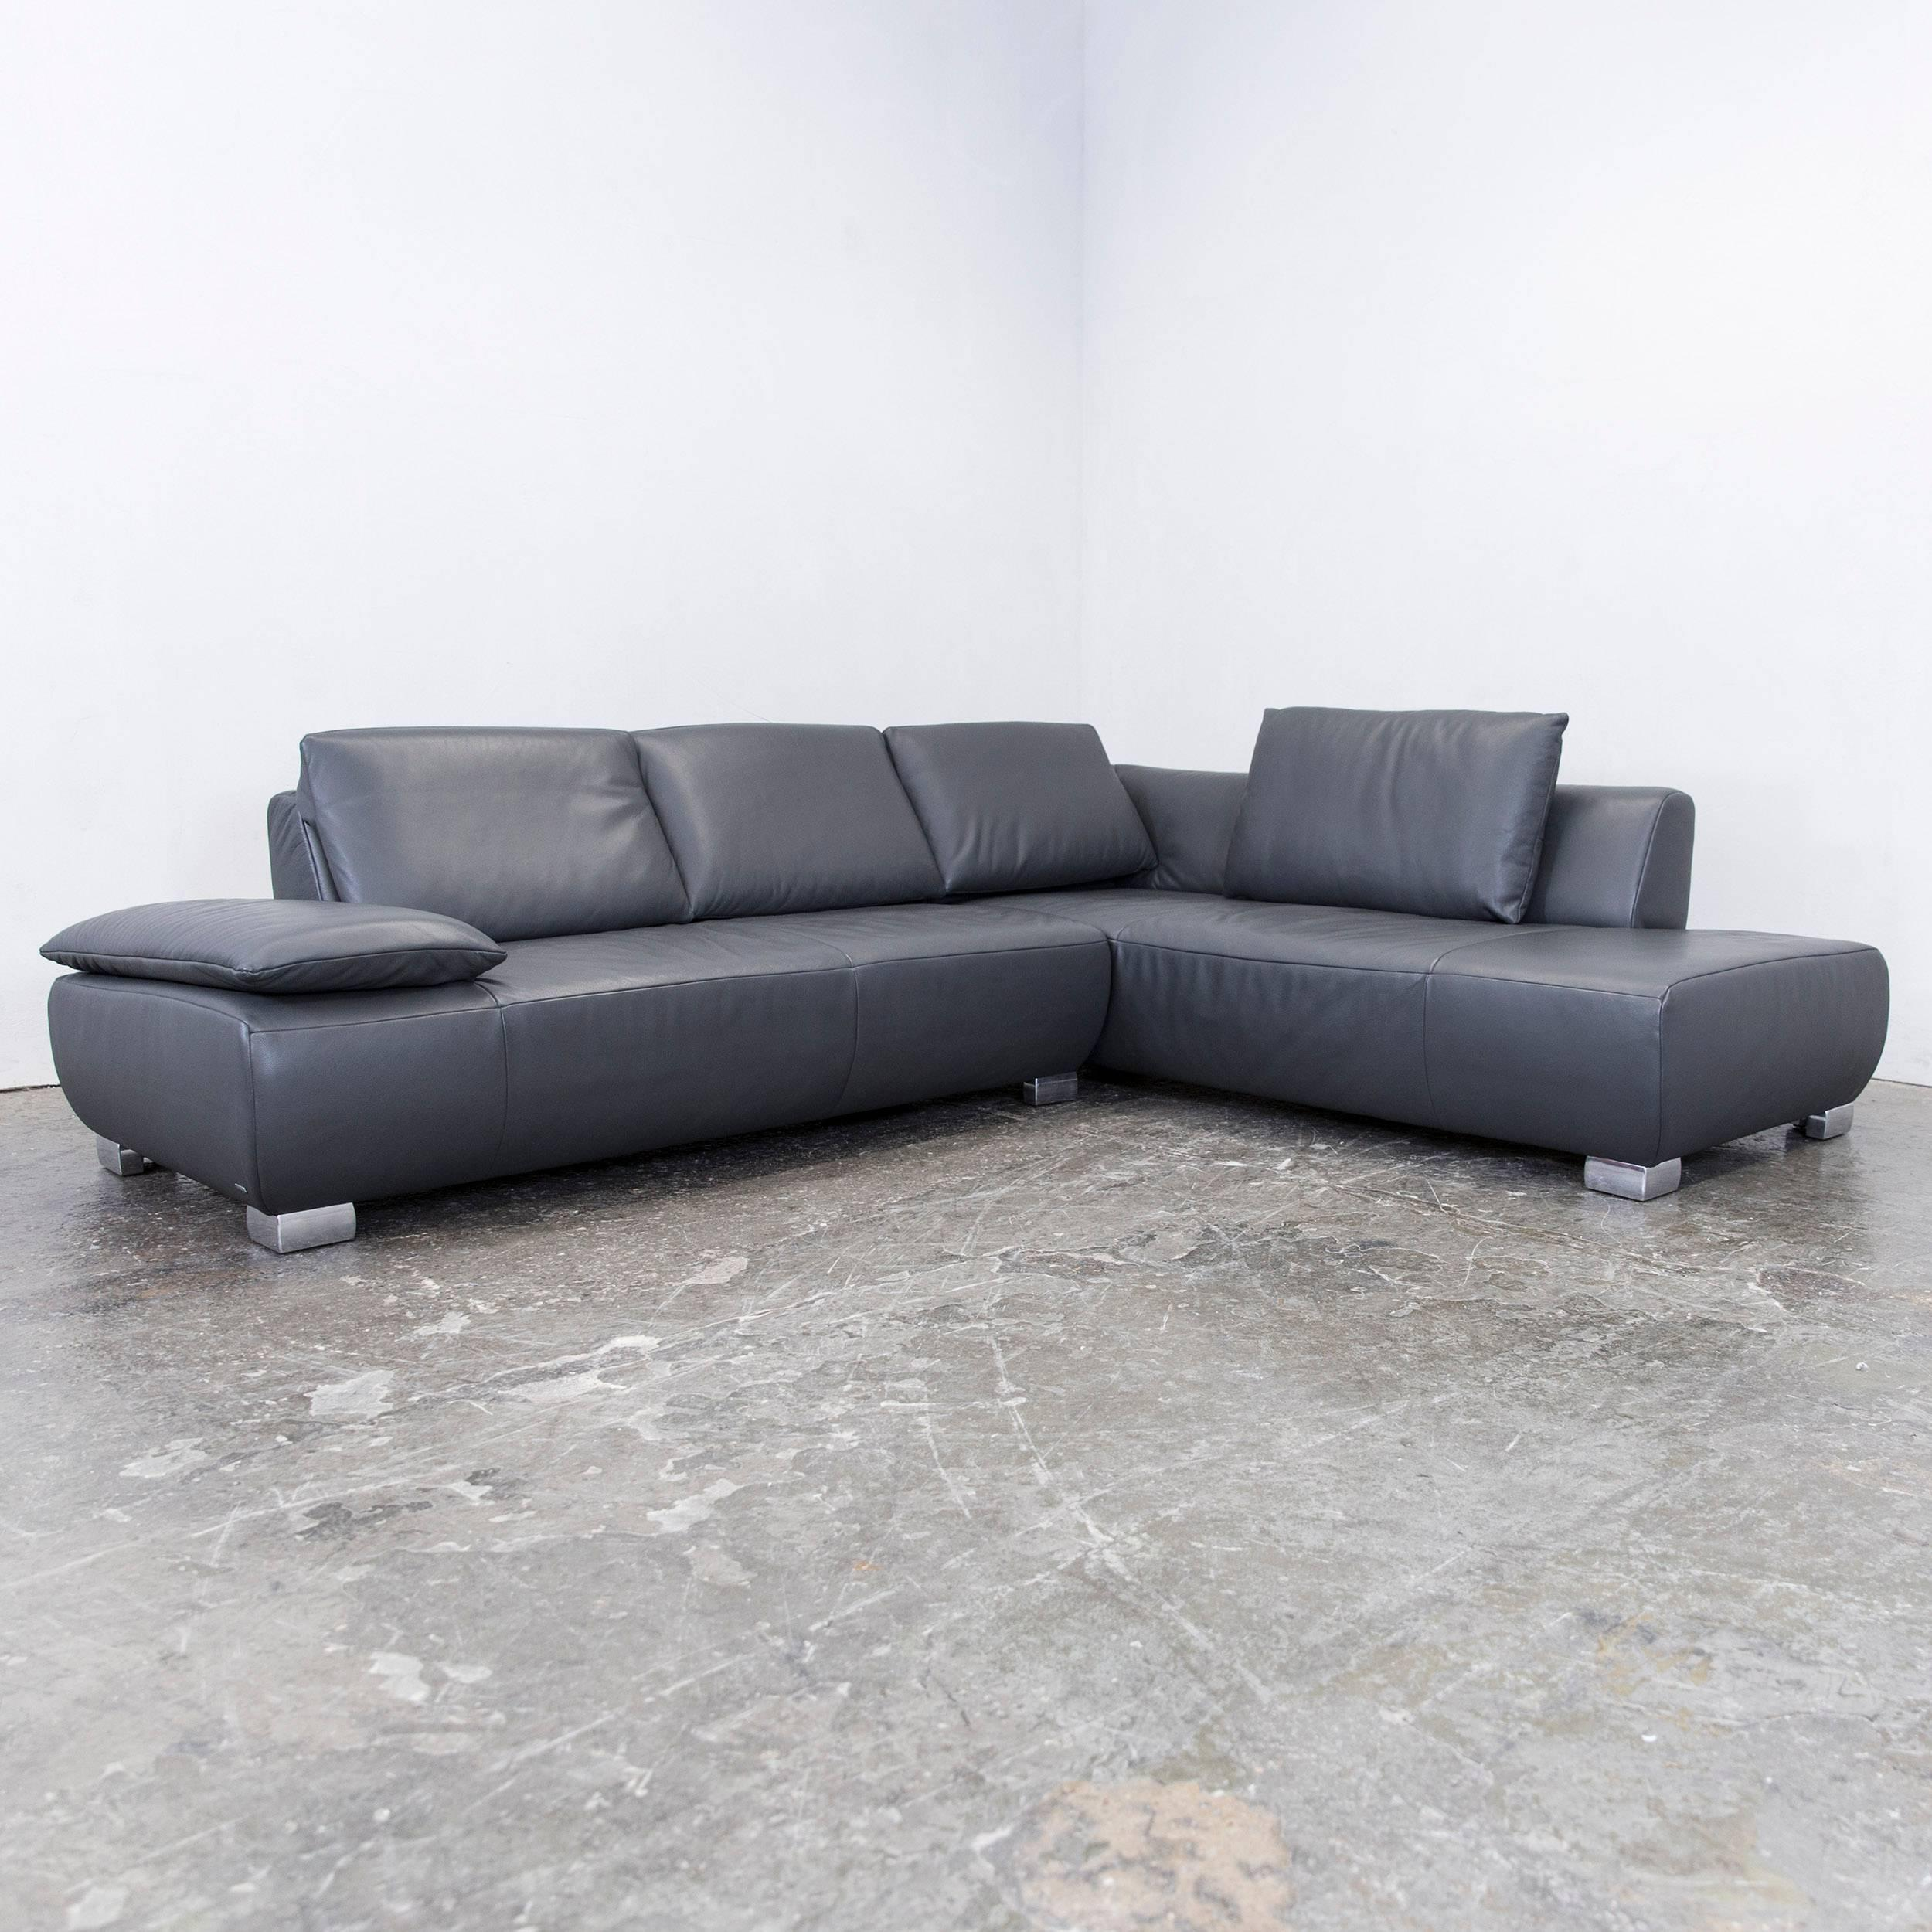 sofa eck interesting modulare sofa designs mit regalen im modernen wohnzimmer with sofa eck. Black Bedroom Furniture Sets. Home Design Ideas